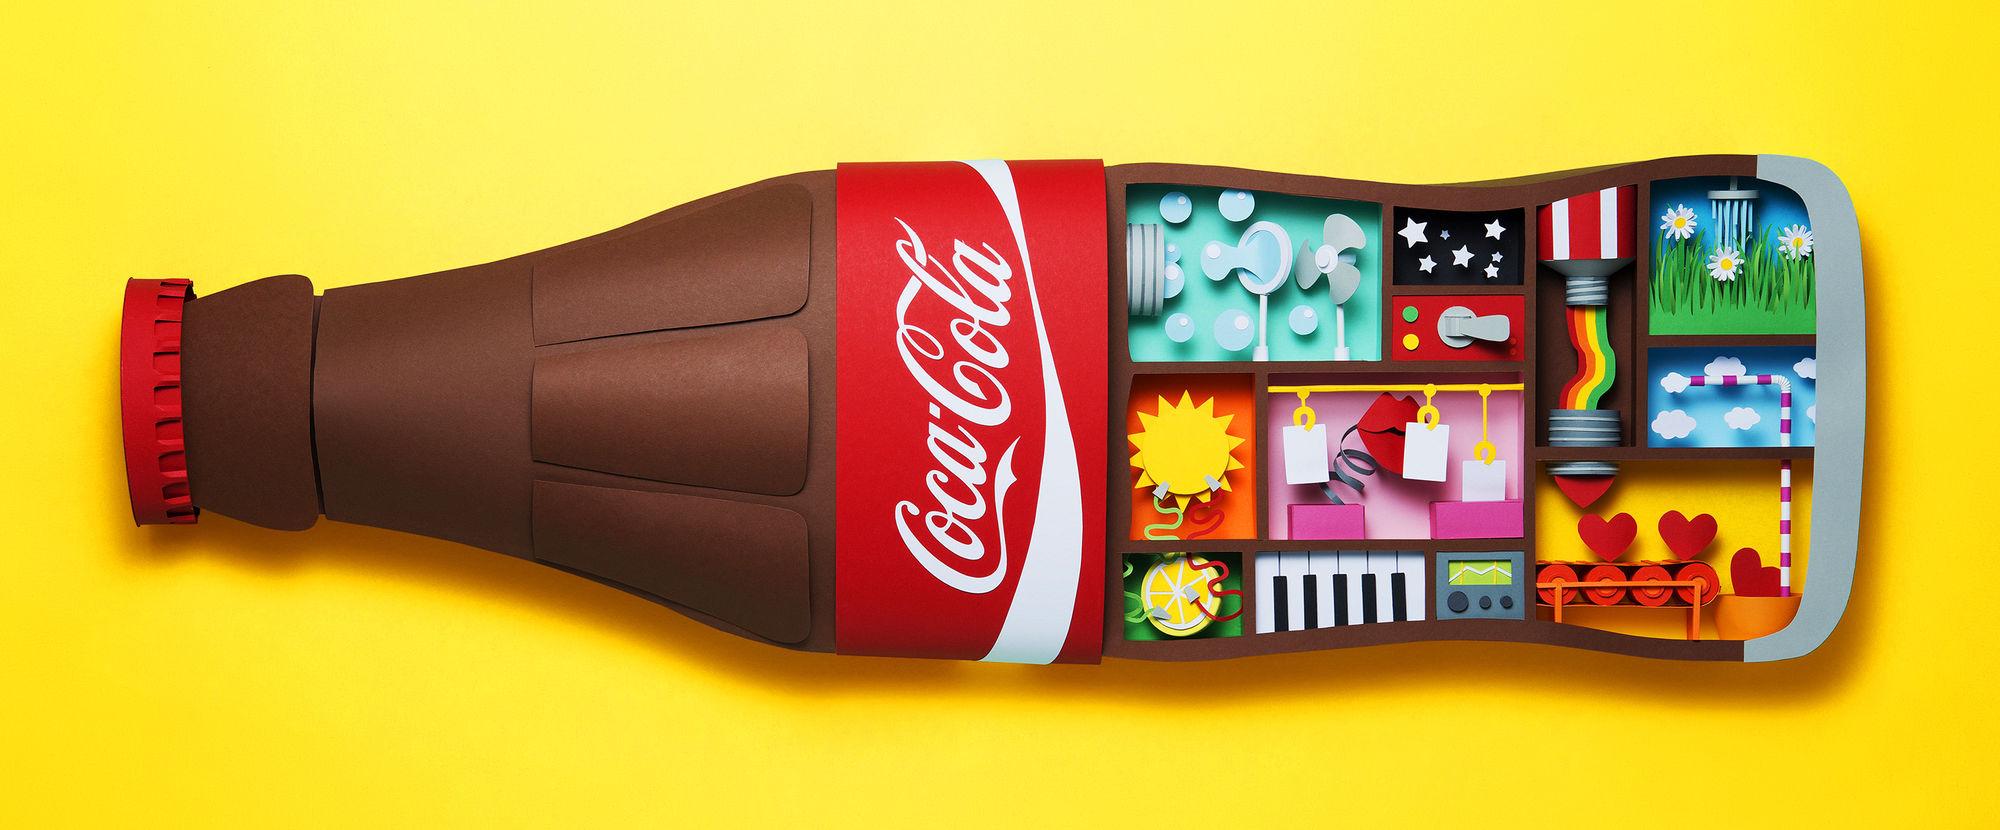 Happiness Machine for Coca-Cola